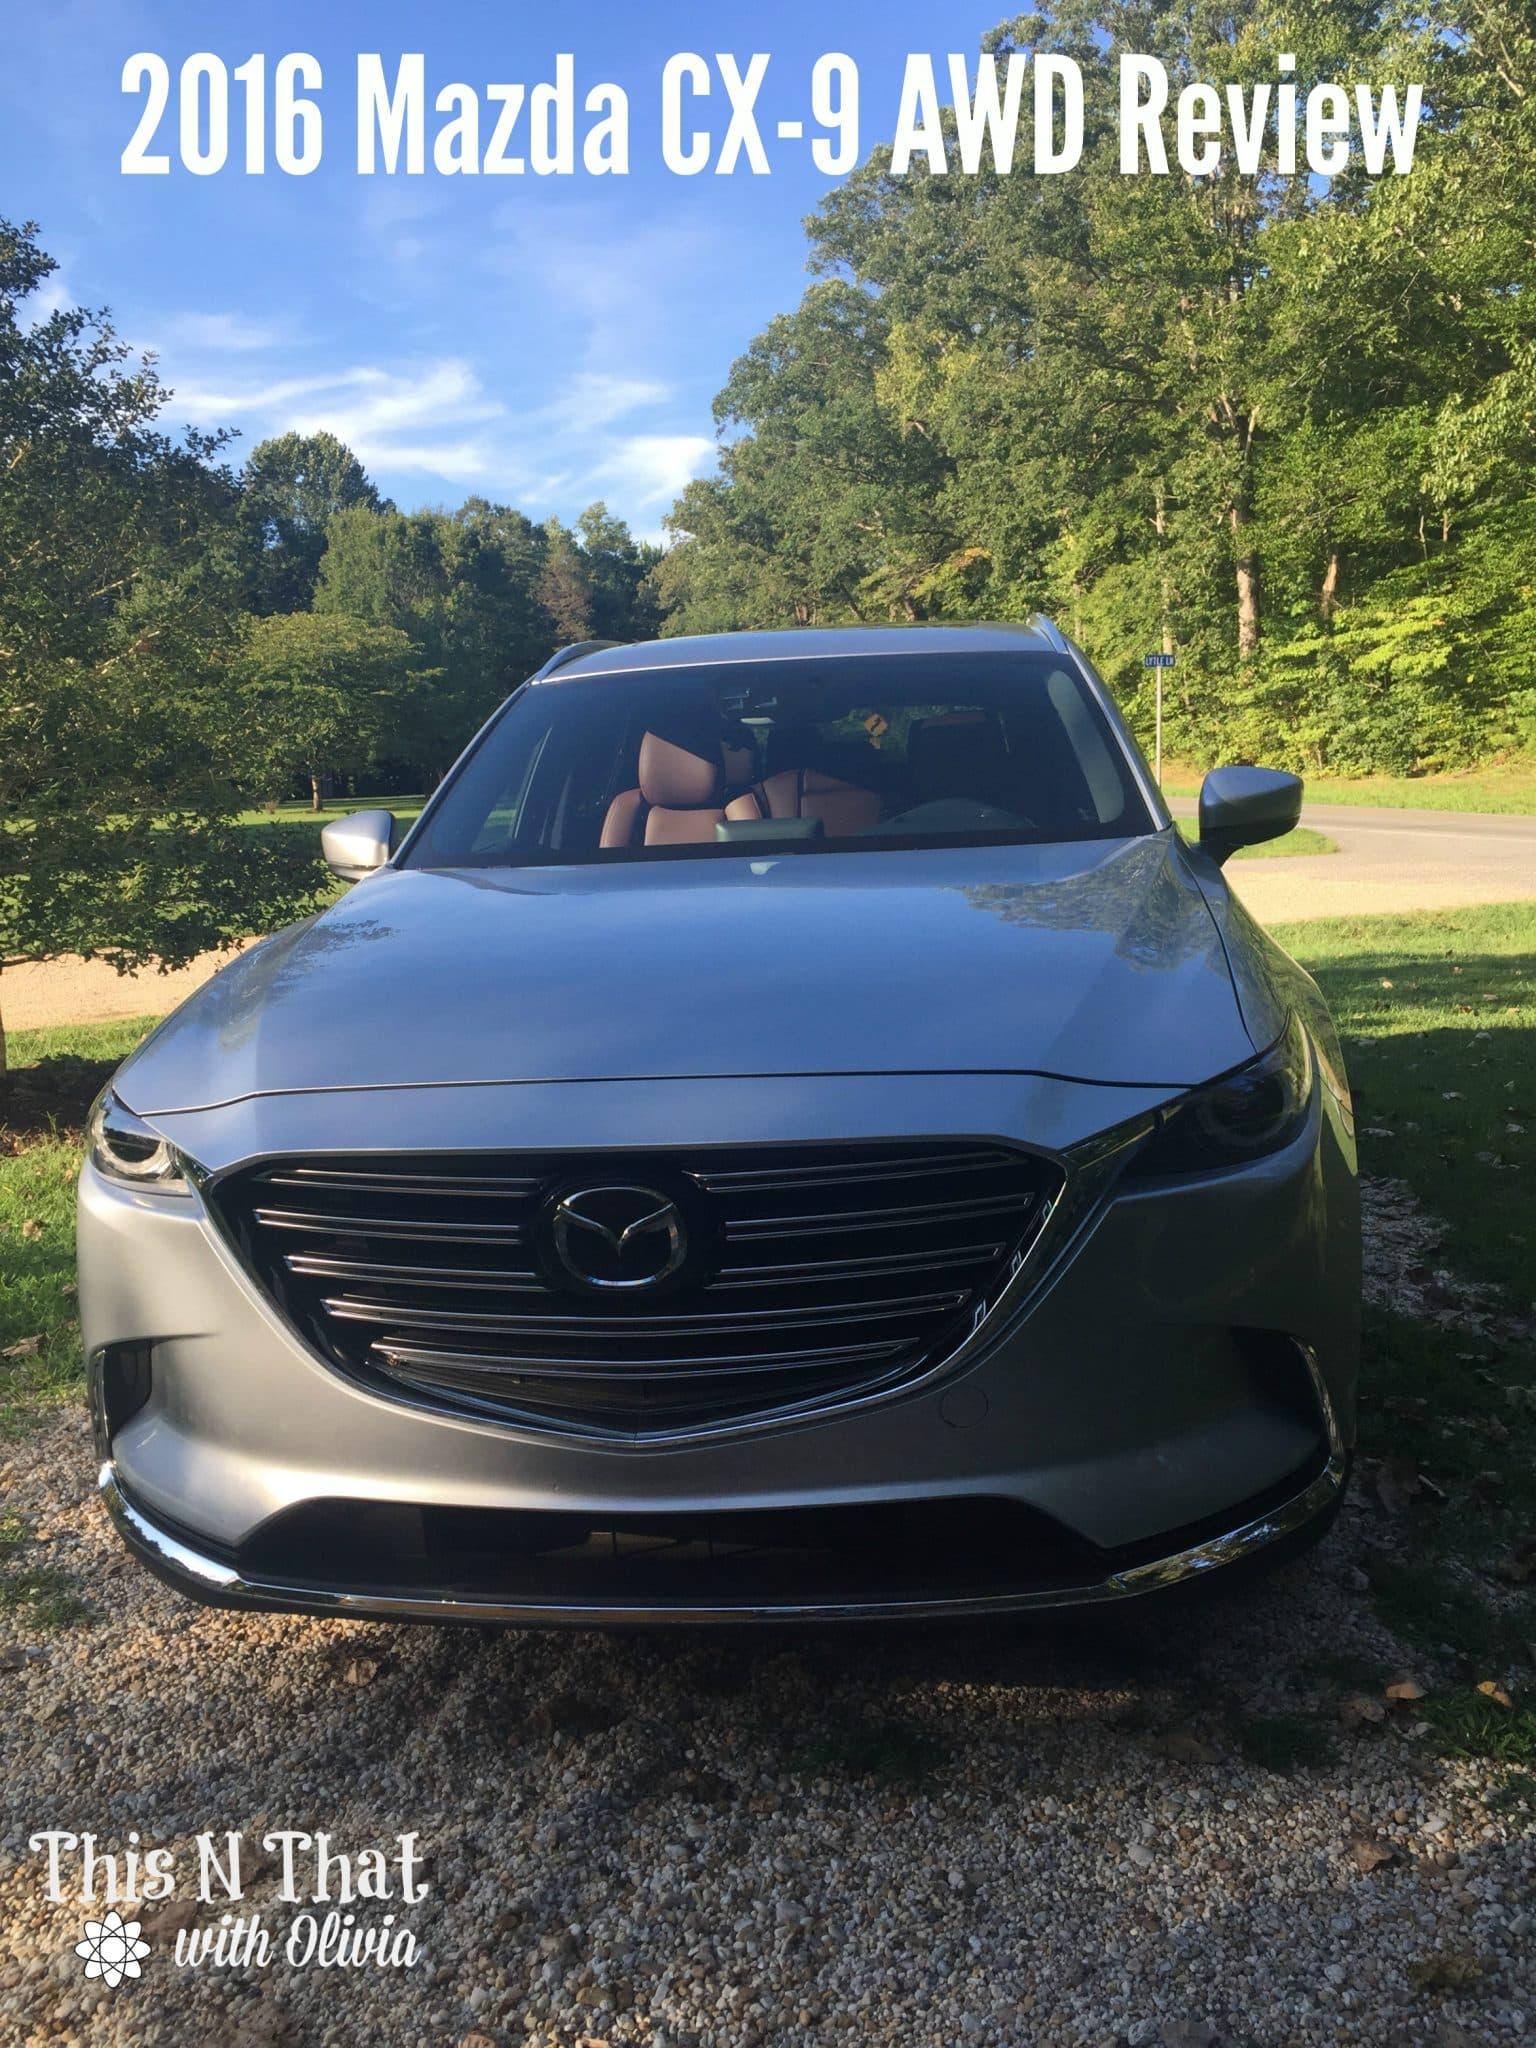 2016 Mazda CX-9 AWD Review #DriveMazda @MazdaUSA #DriveShop #Ad | ThisNThatwithOlivia.com